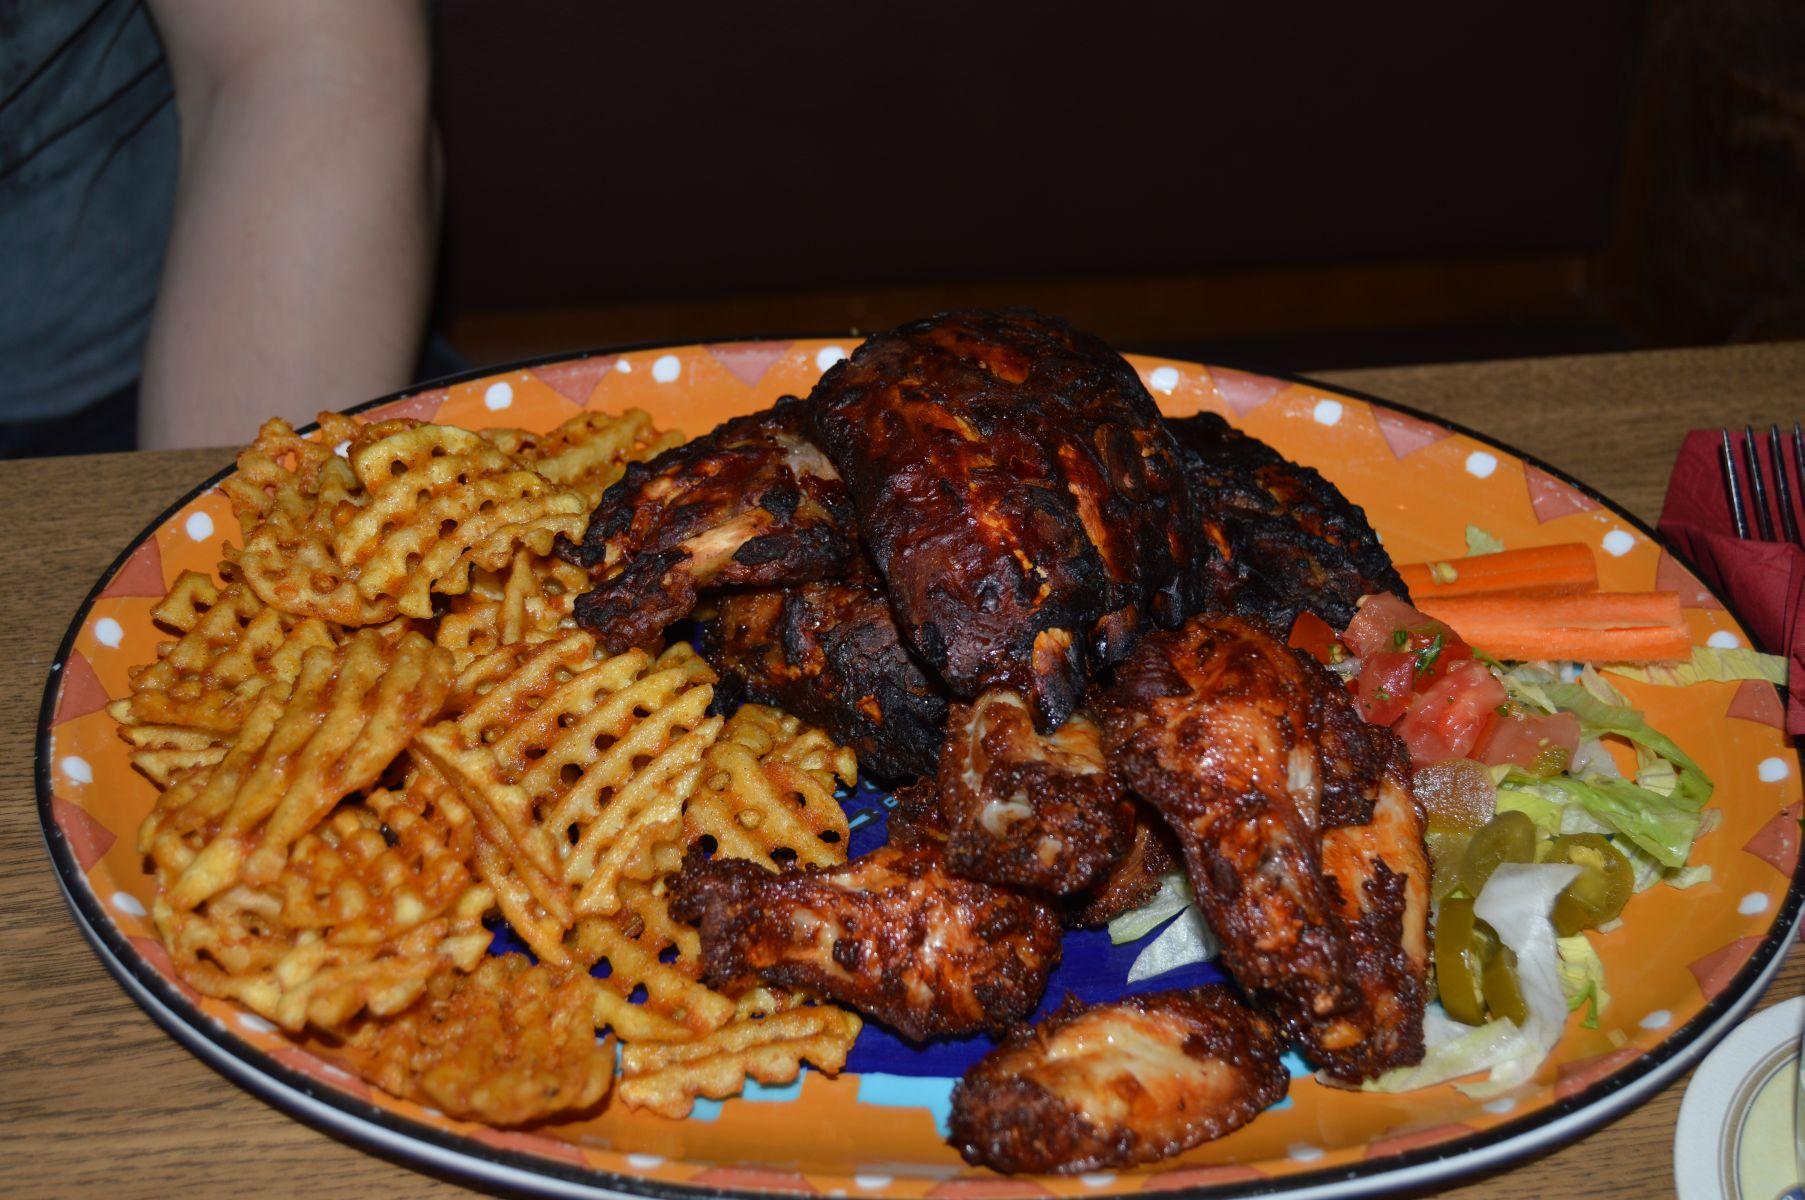 https://foodloader.net/sk0r_2013-08-24_Criss_Cuts_Ribs_Wings_Salad.jpg